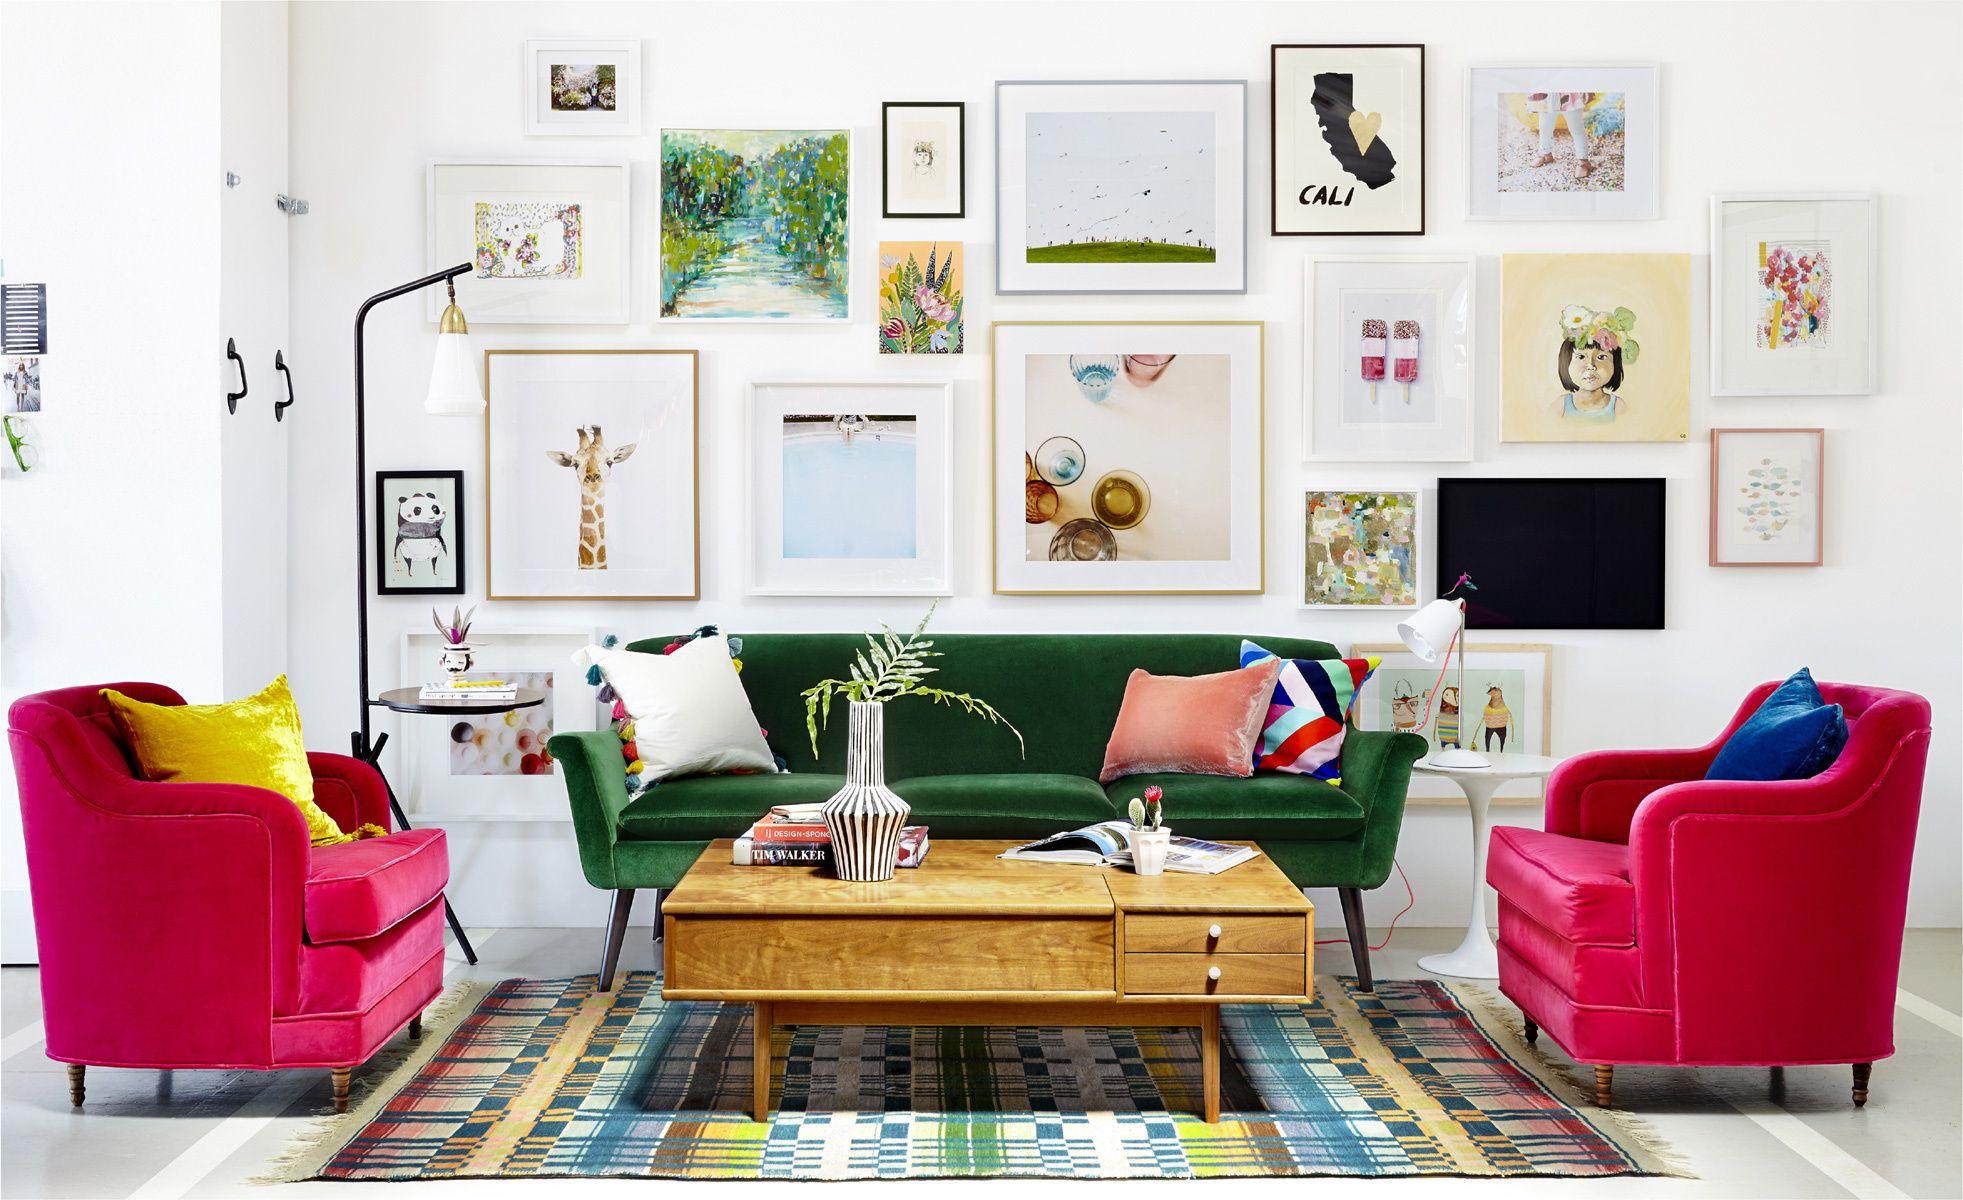 Los infalibles de Ikea | Ads, Living rooms and Interiors